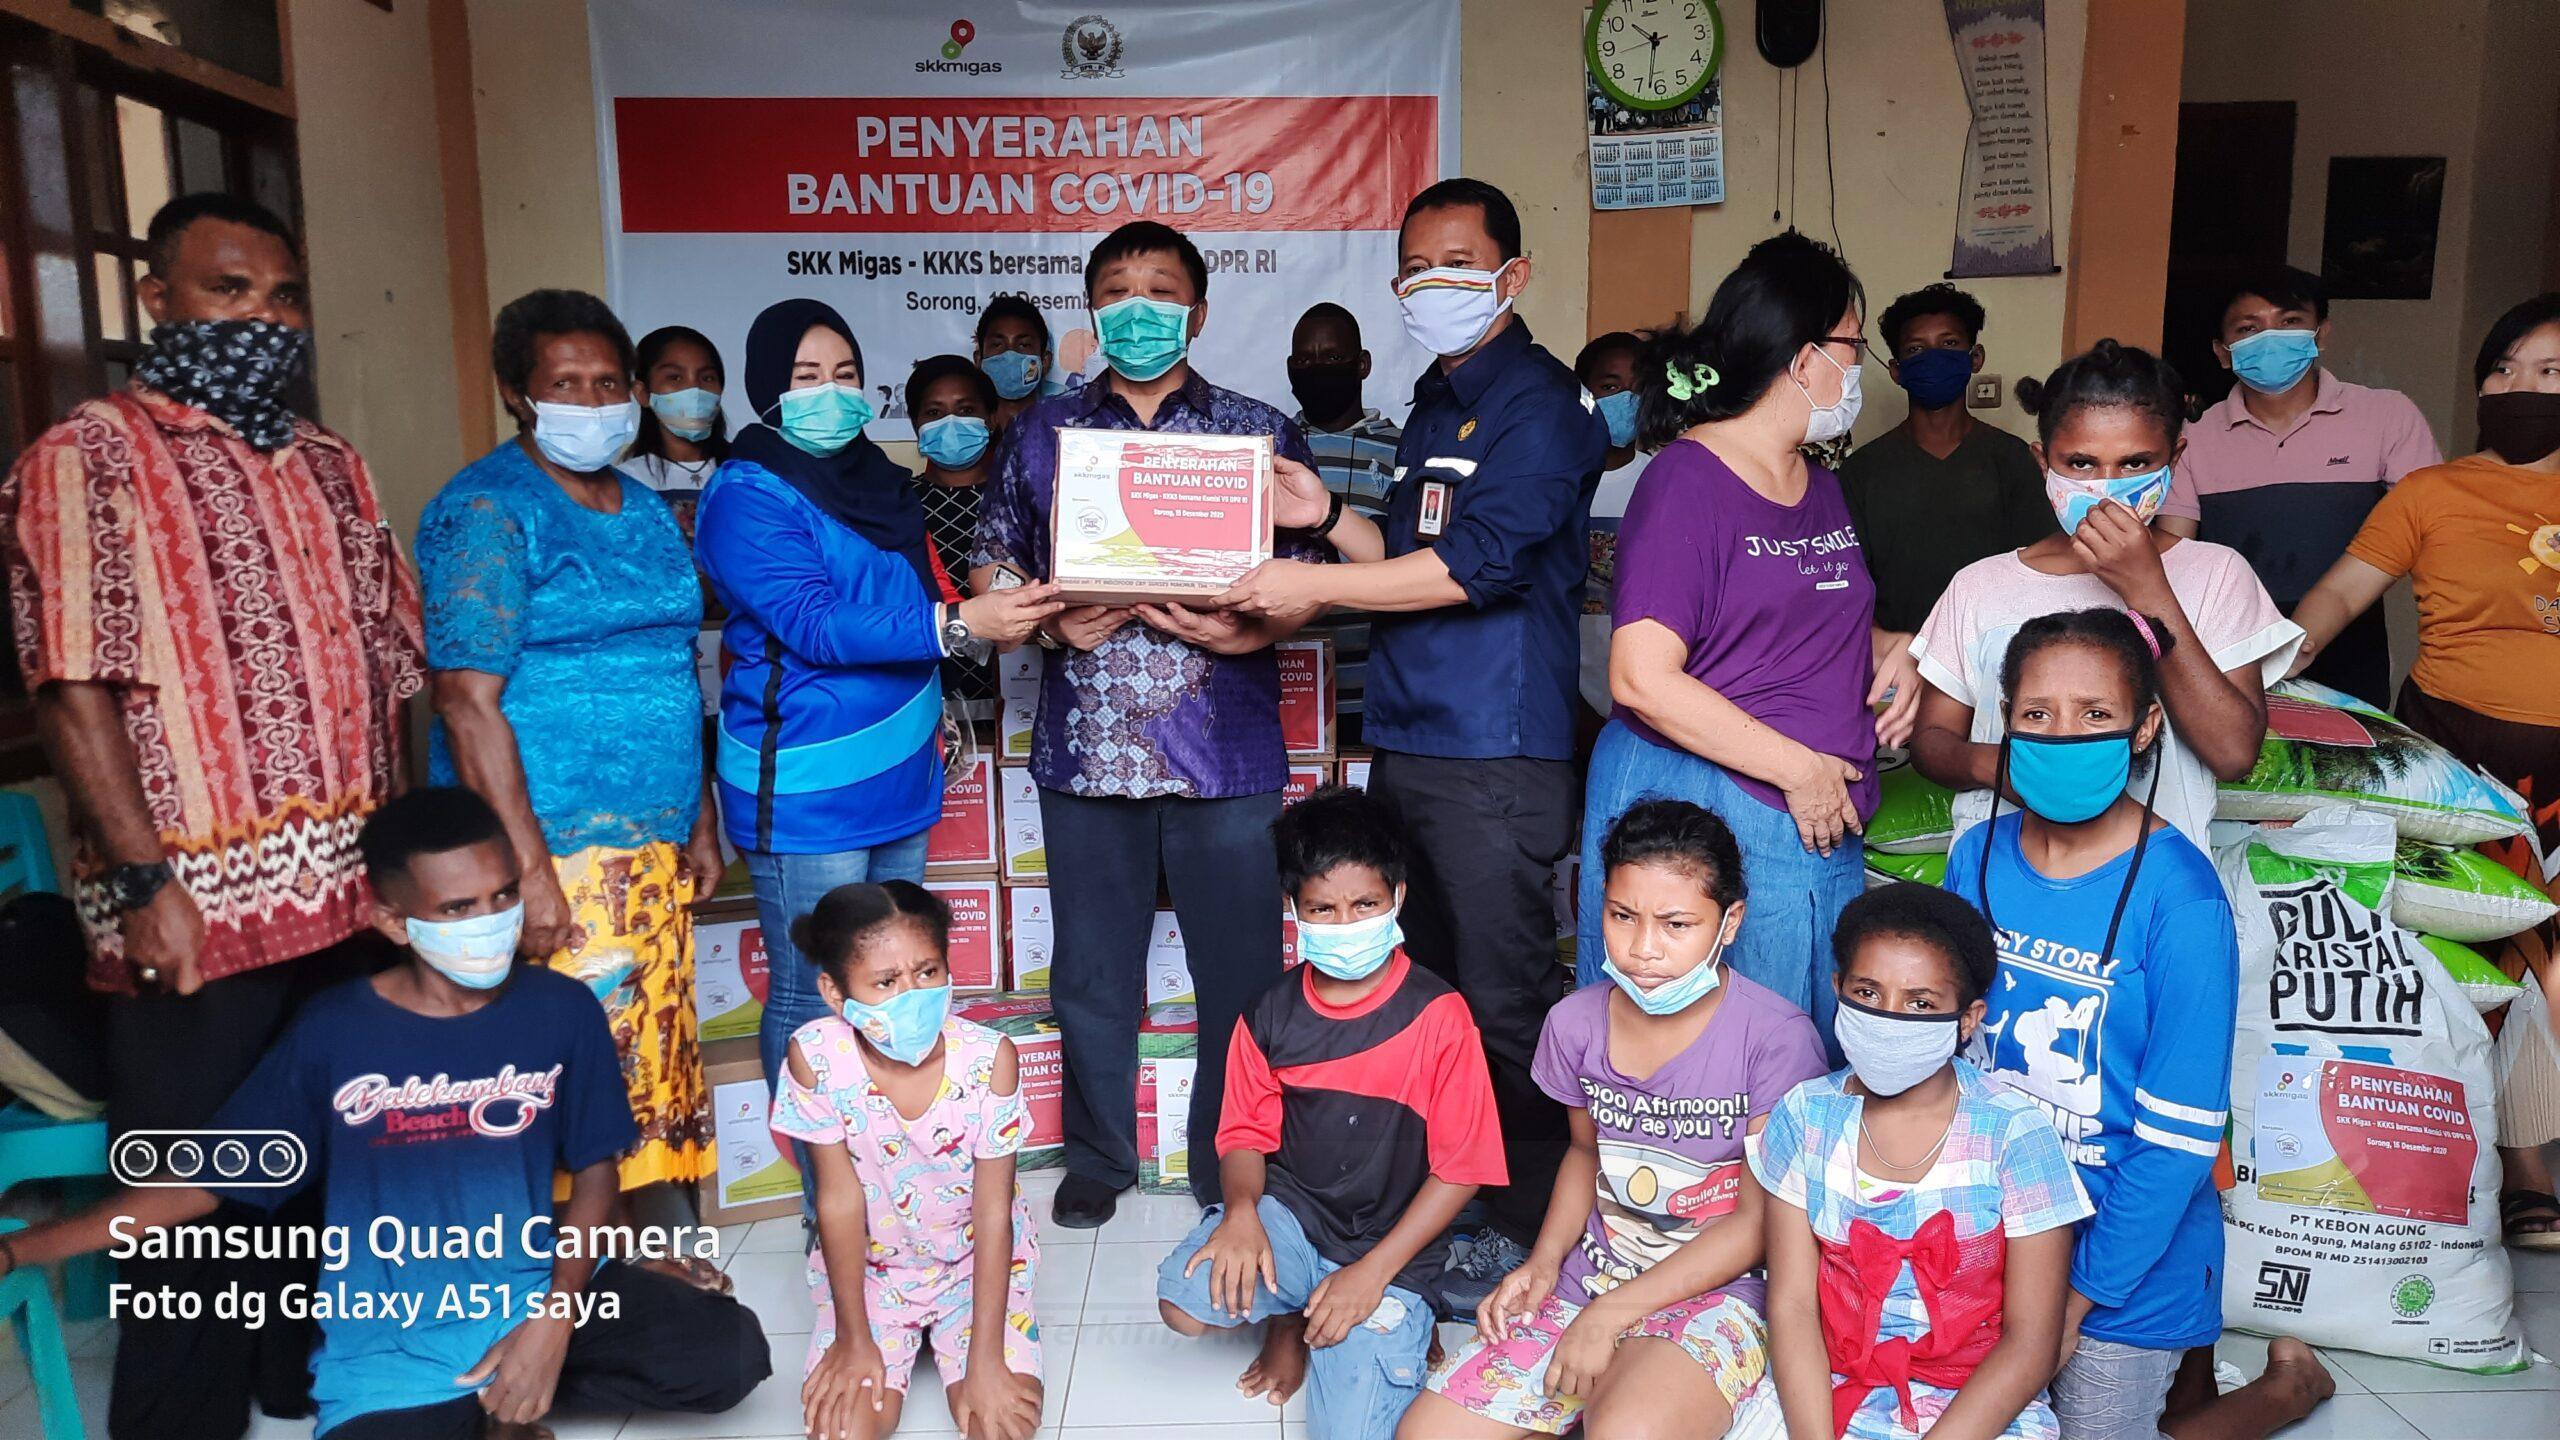 Rico Sia Bersama SKK Migas Serahkan Bantuan Sembako ke 6 Panti Asuhan di Sorong 5 20201216 103124 scaled